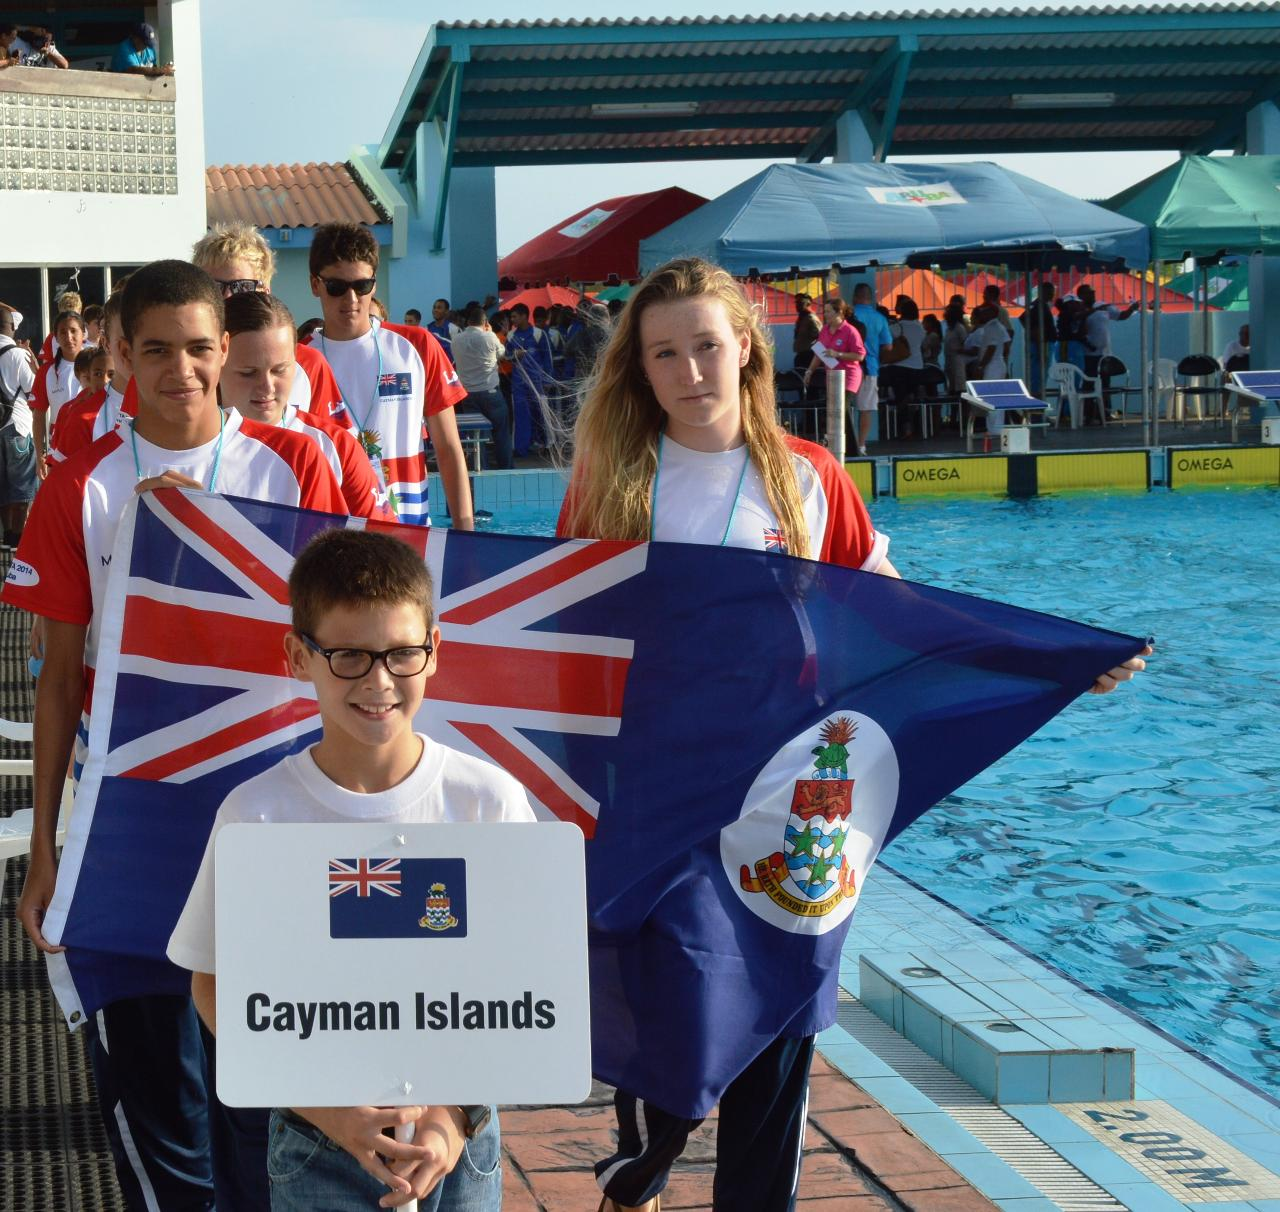 amateur Cayman association islands swimming